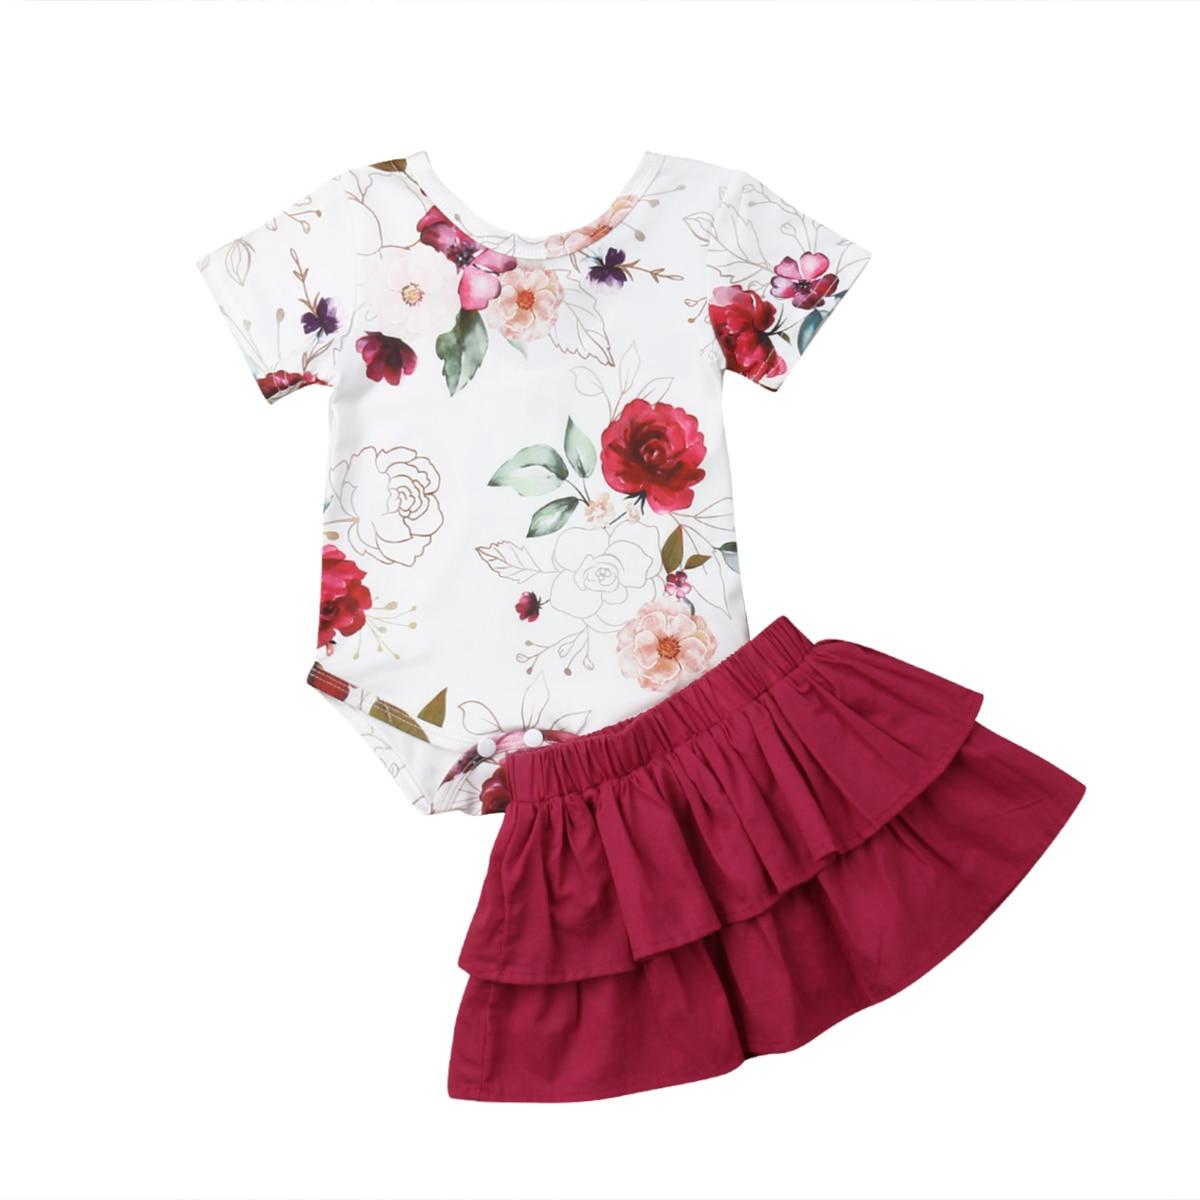 Newborn Infant Baby Girl 2PCS Set Outfits Short Sleeve Print Bodysuit+Mini Skirts Outfit Girls Summer Sunsuit